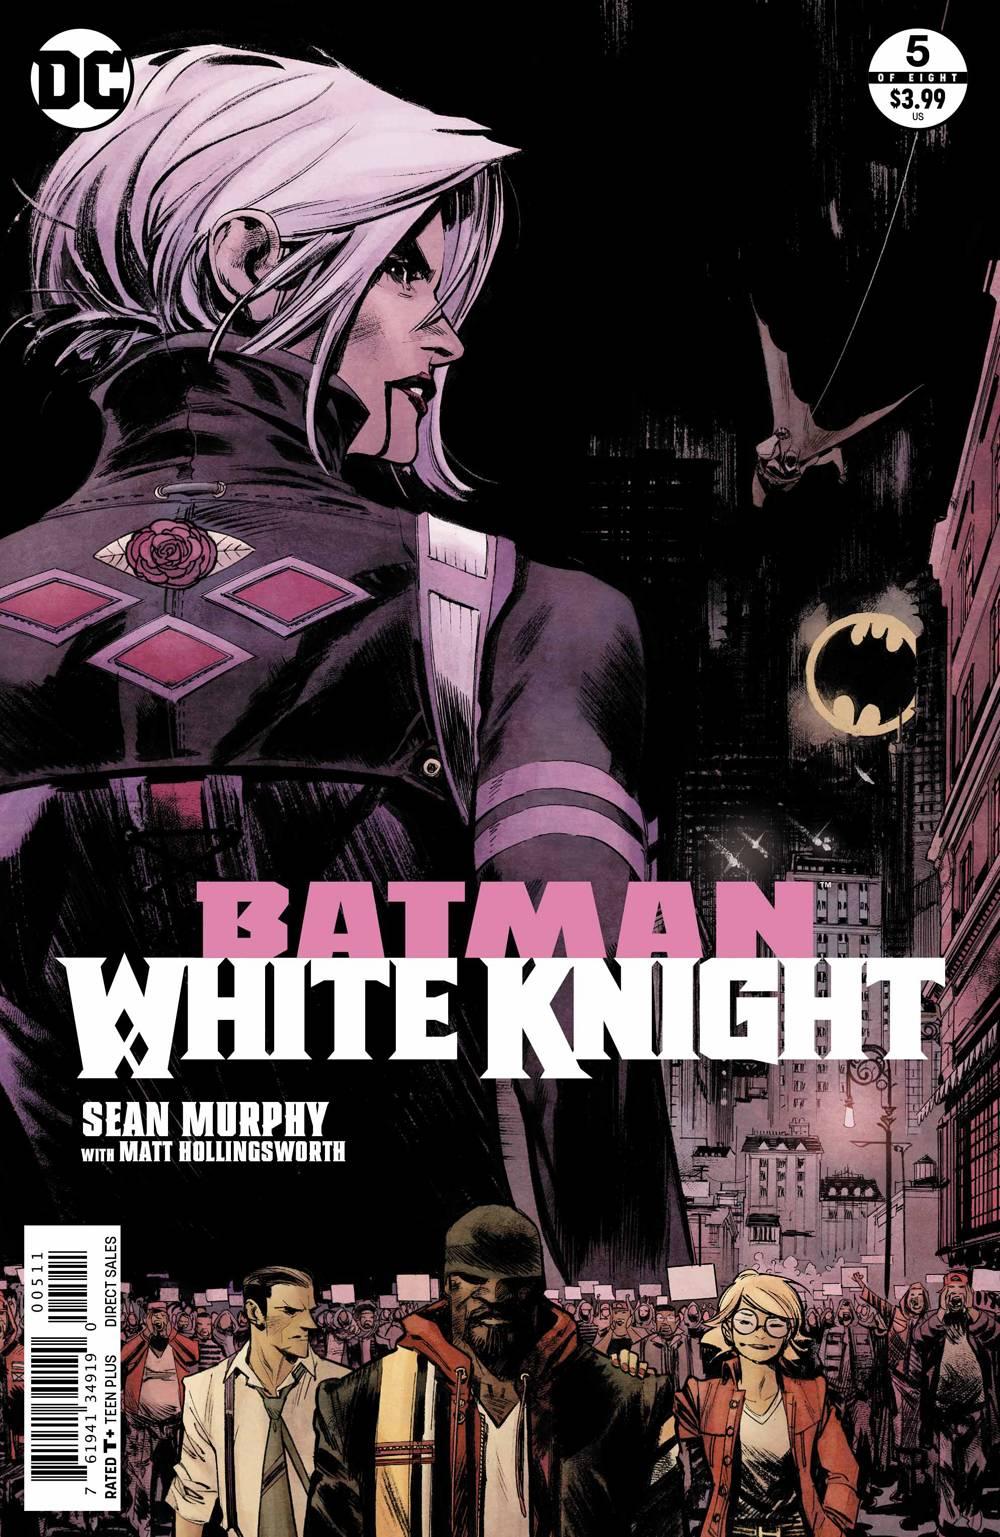 batman white knight #5.jpg